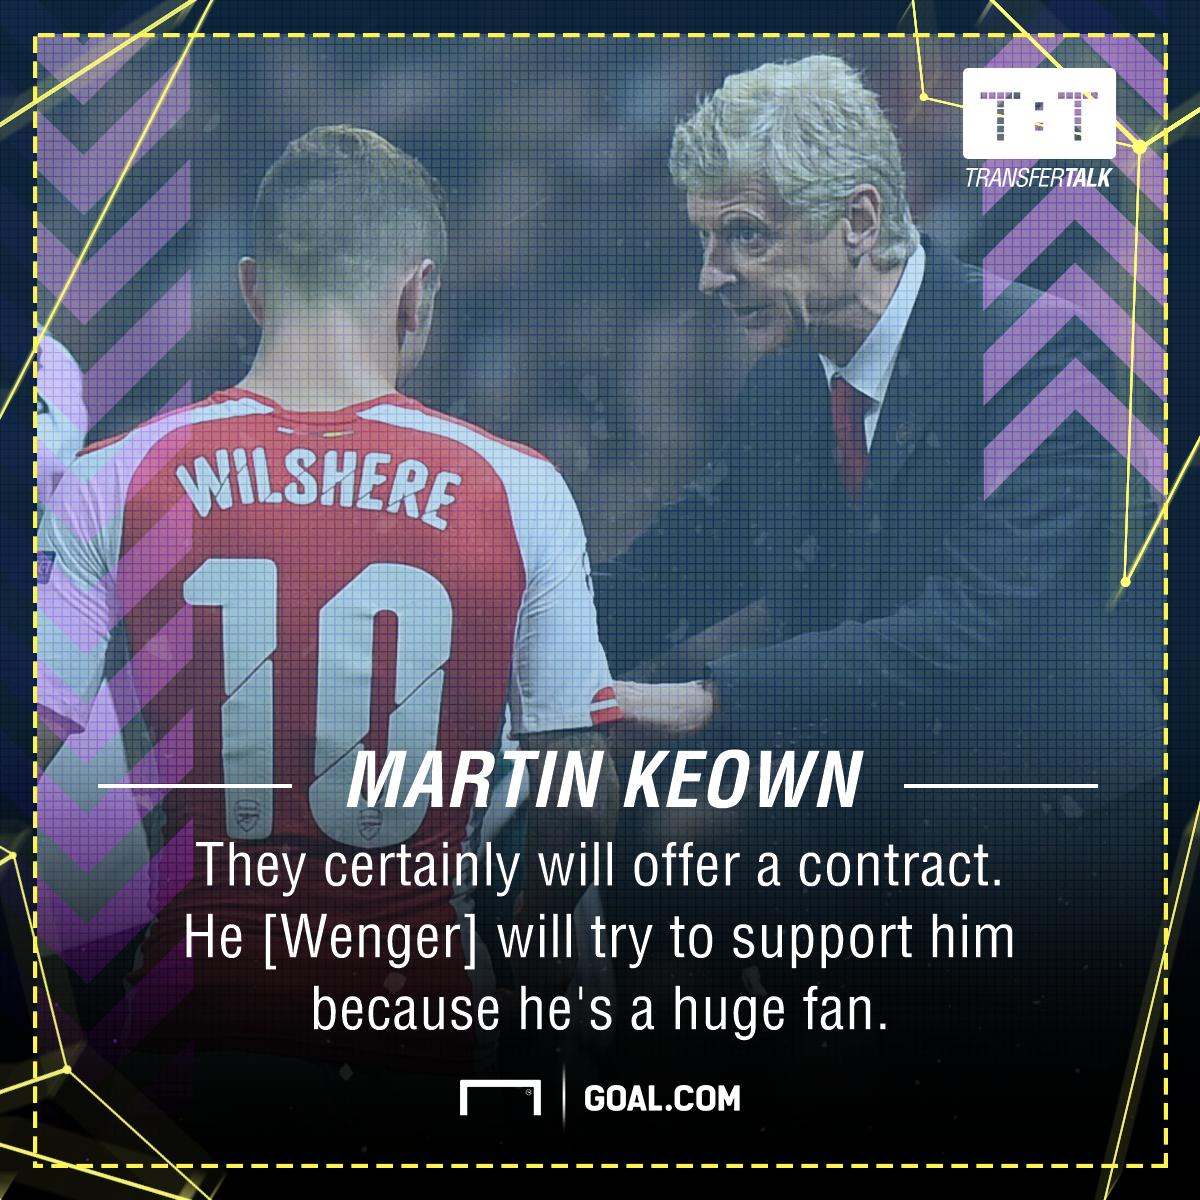 Jack Wilshere Martin Keown Arsenal contract